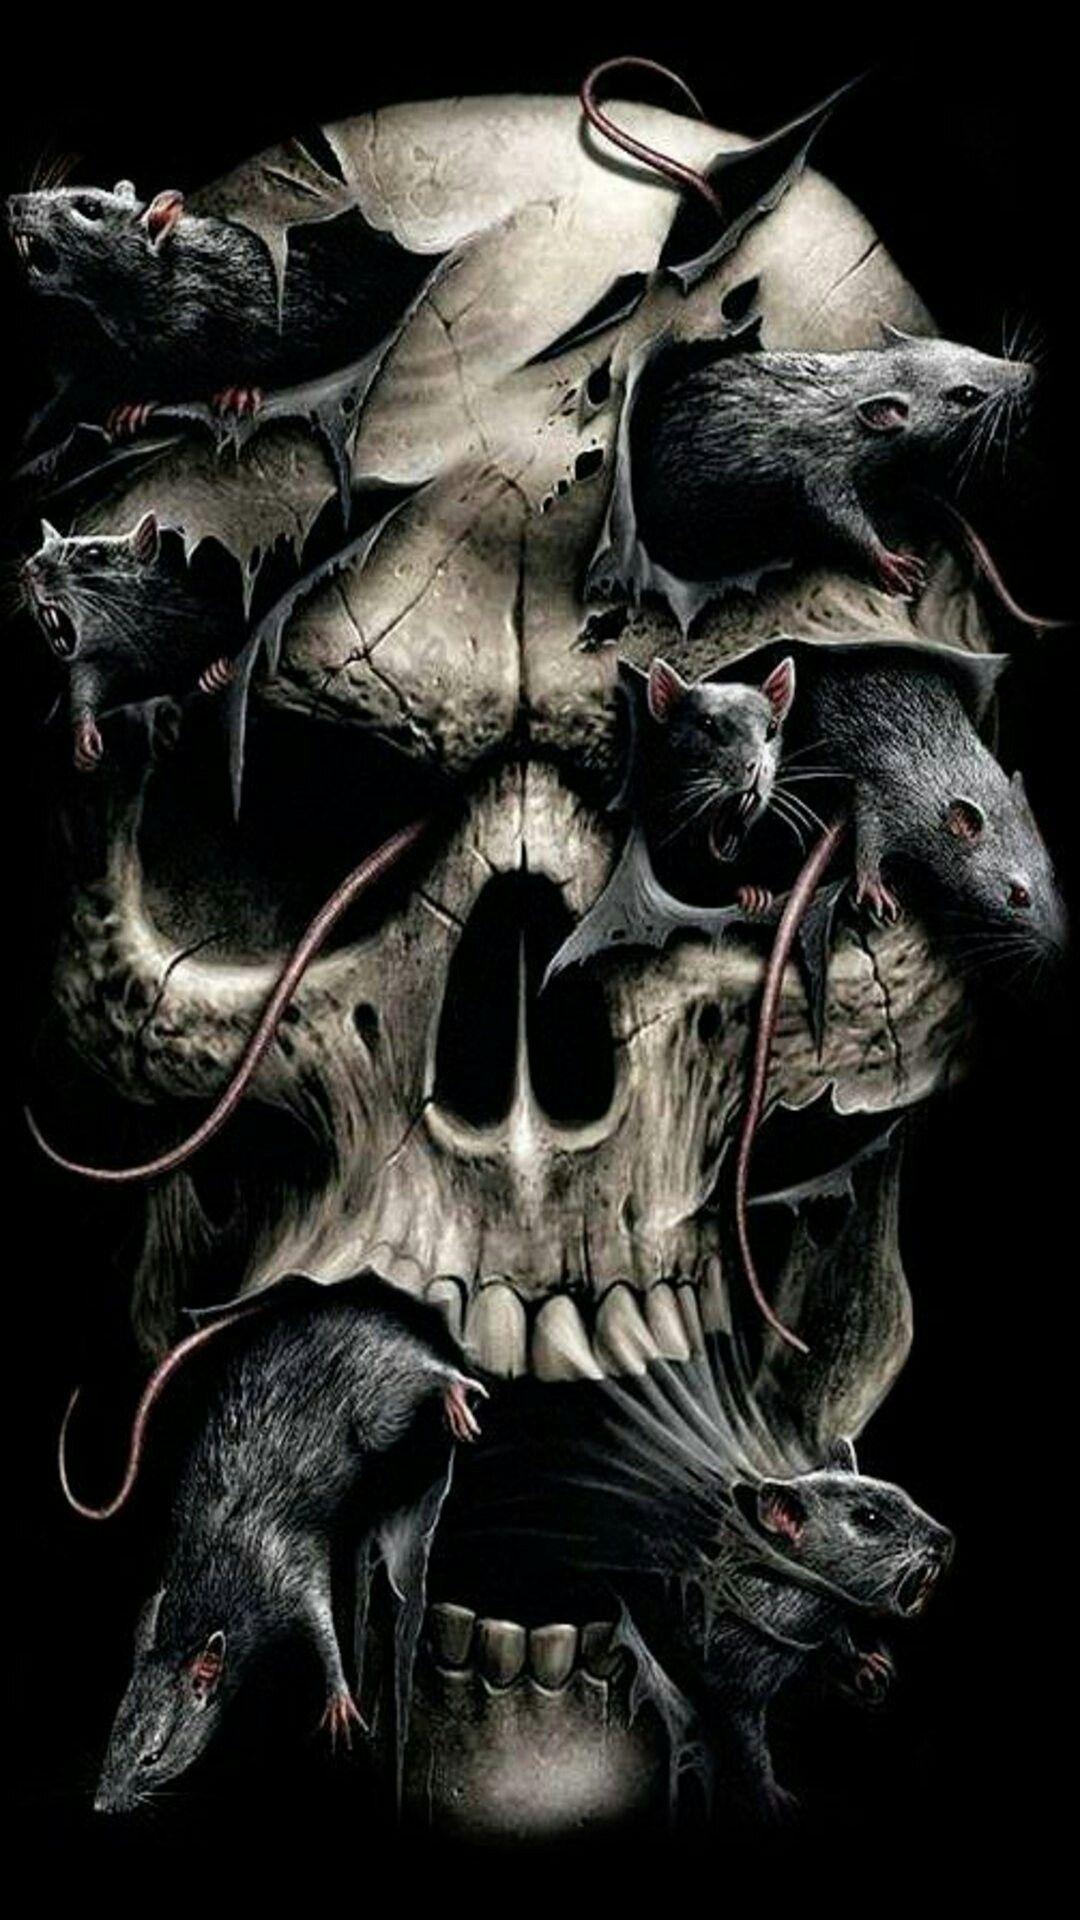 Skull Wallpaper For Phone Metro Wallpapers